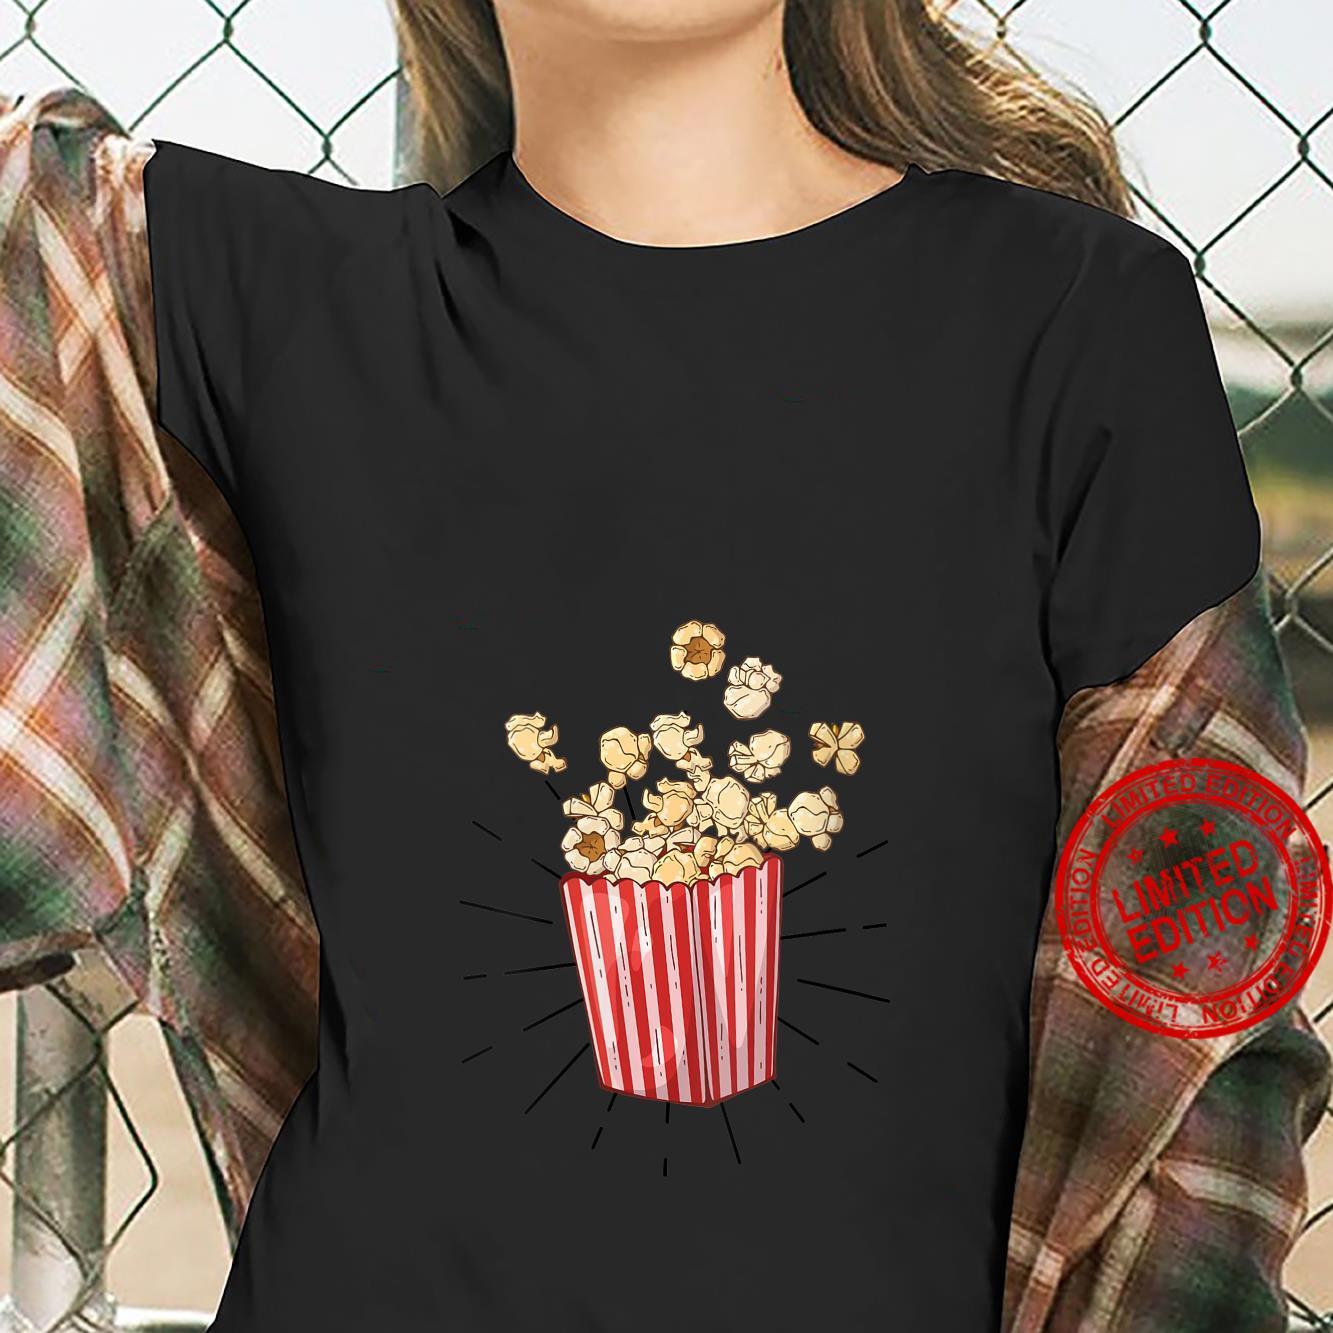 Womens Retro vintage Popcorn for cinema and living room popcorn Shirt ladies tee